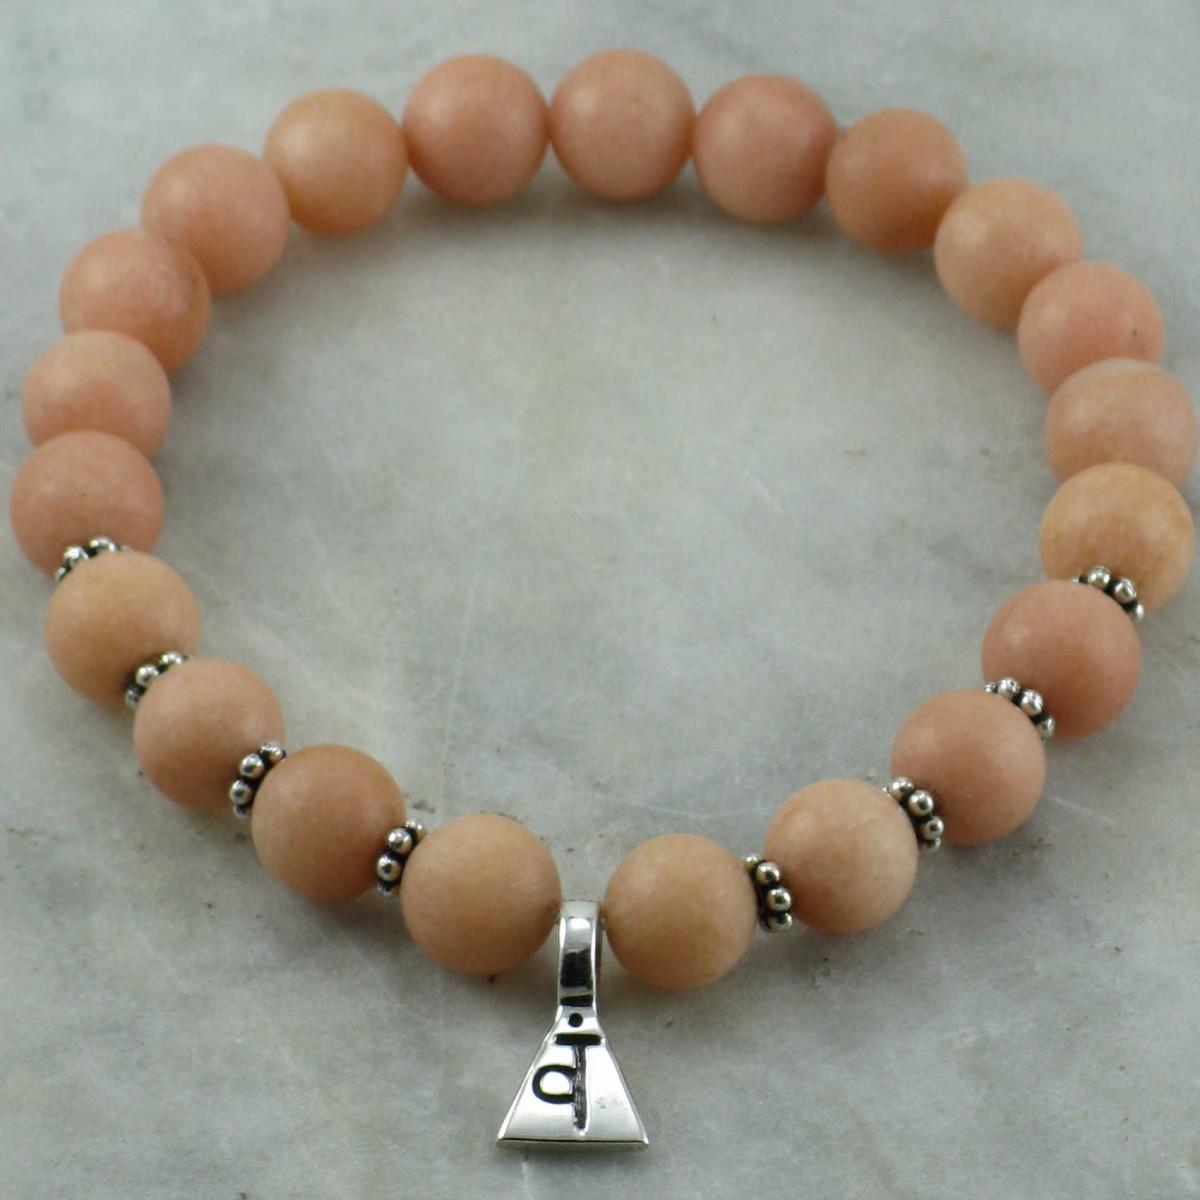 Sacral_Chakra_Mala_Bracelet_21_Tangerine_Quartz_Mala_Beads_1700